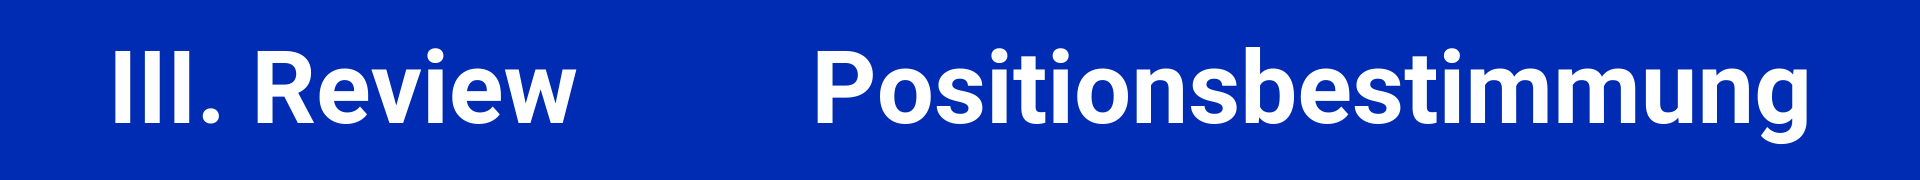 Baustein 3 Review - Positionsbestimmung 1920zu180-20